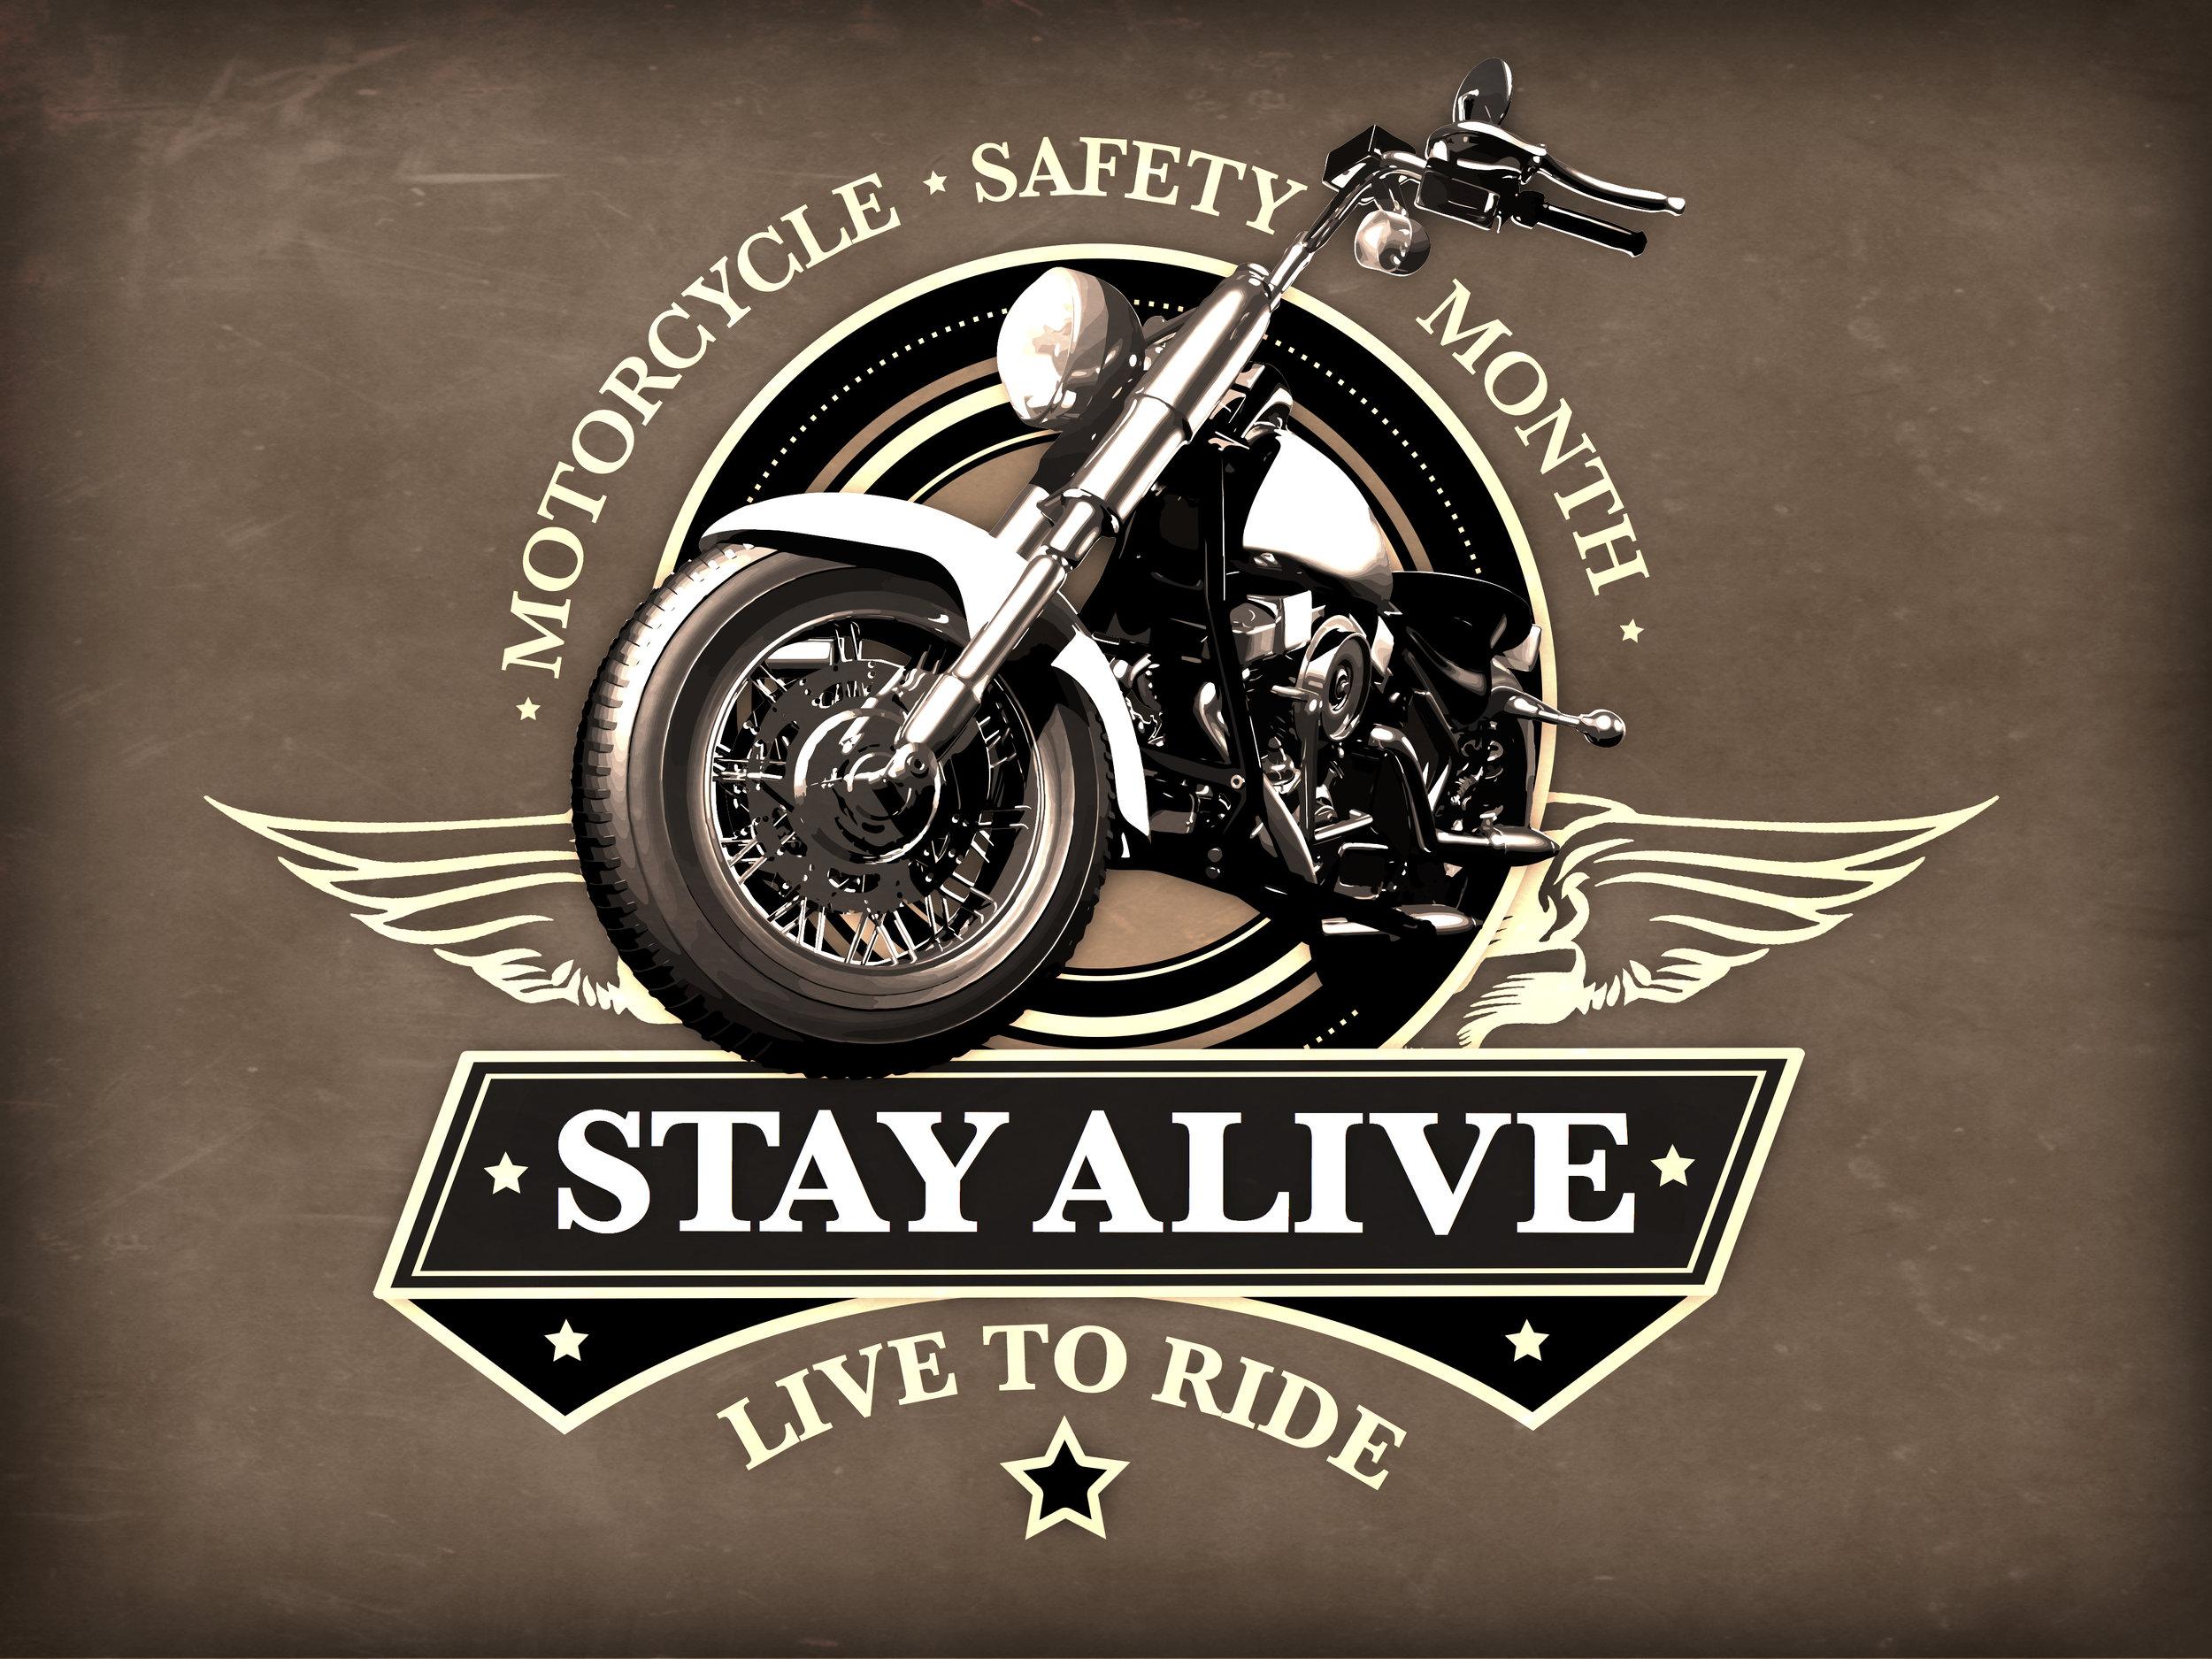 MotorcycleSafetyMonth2015.jpg